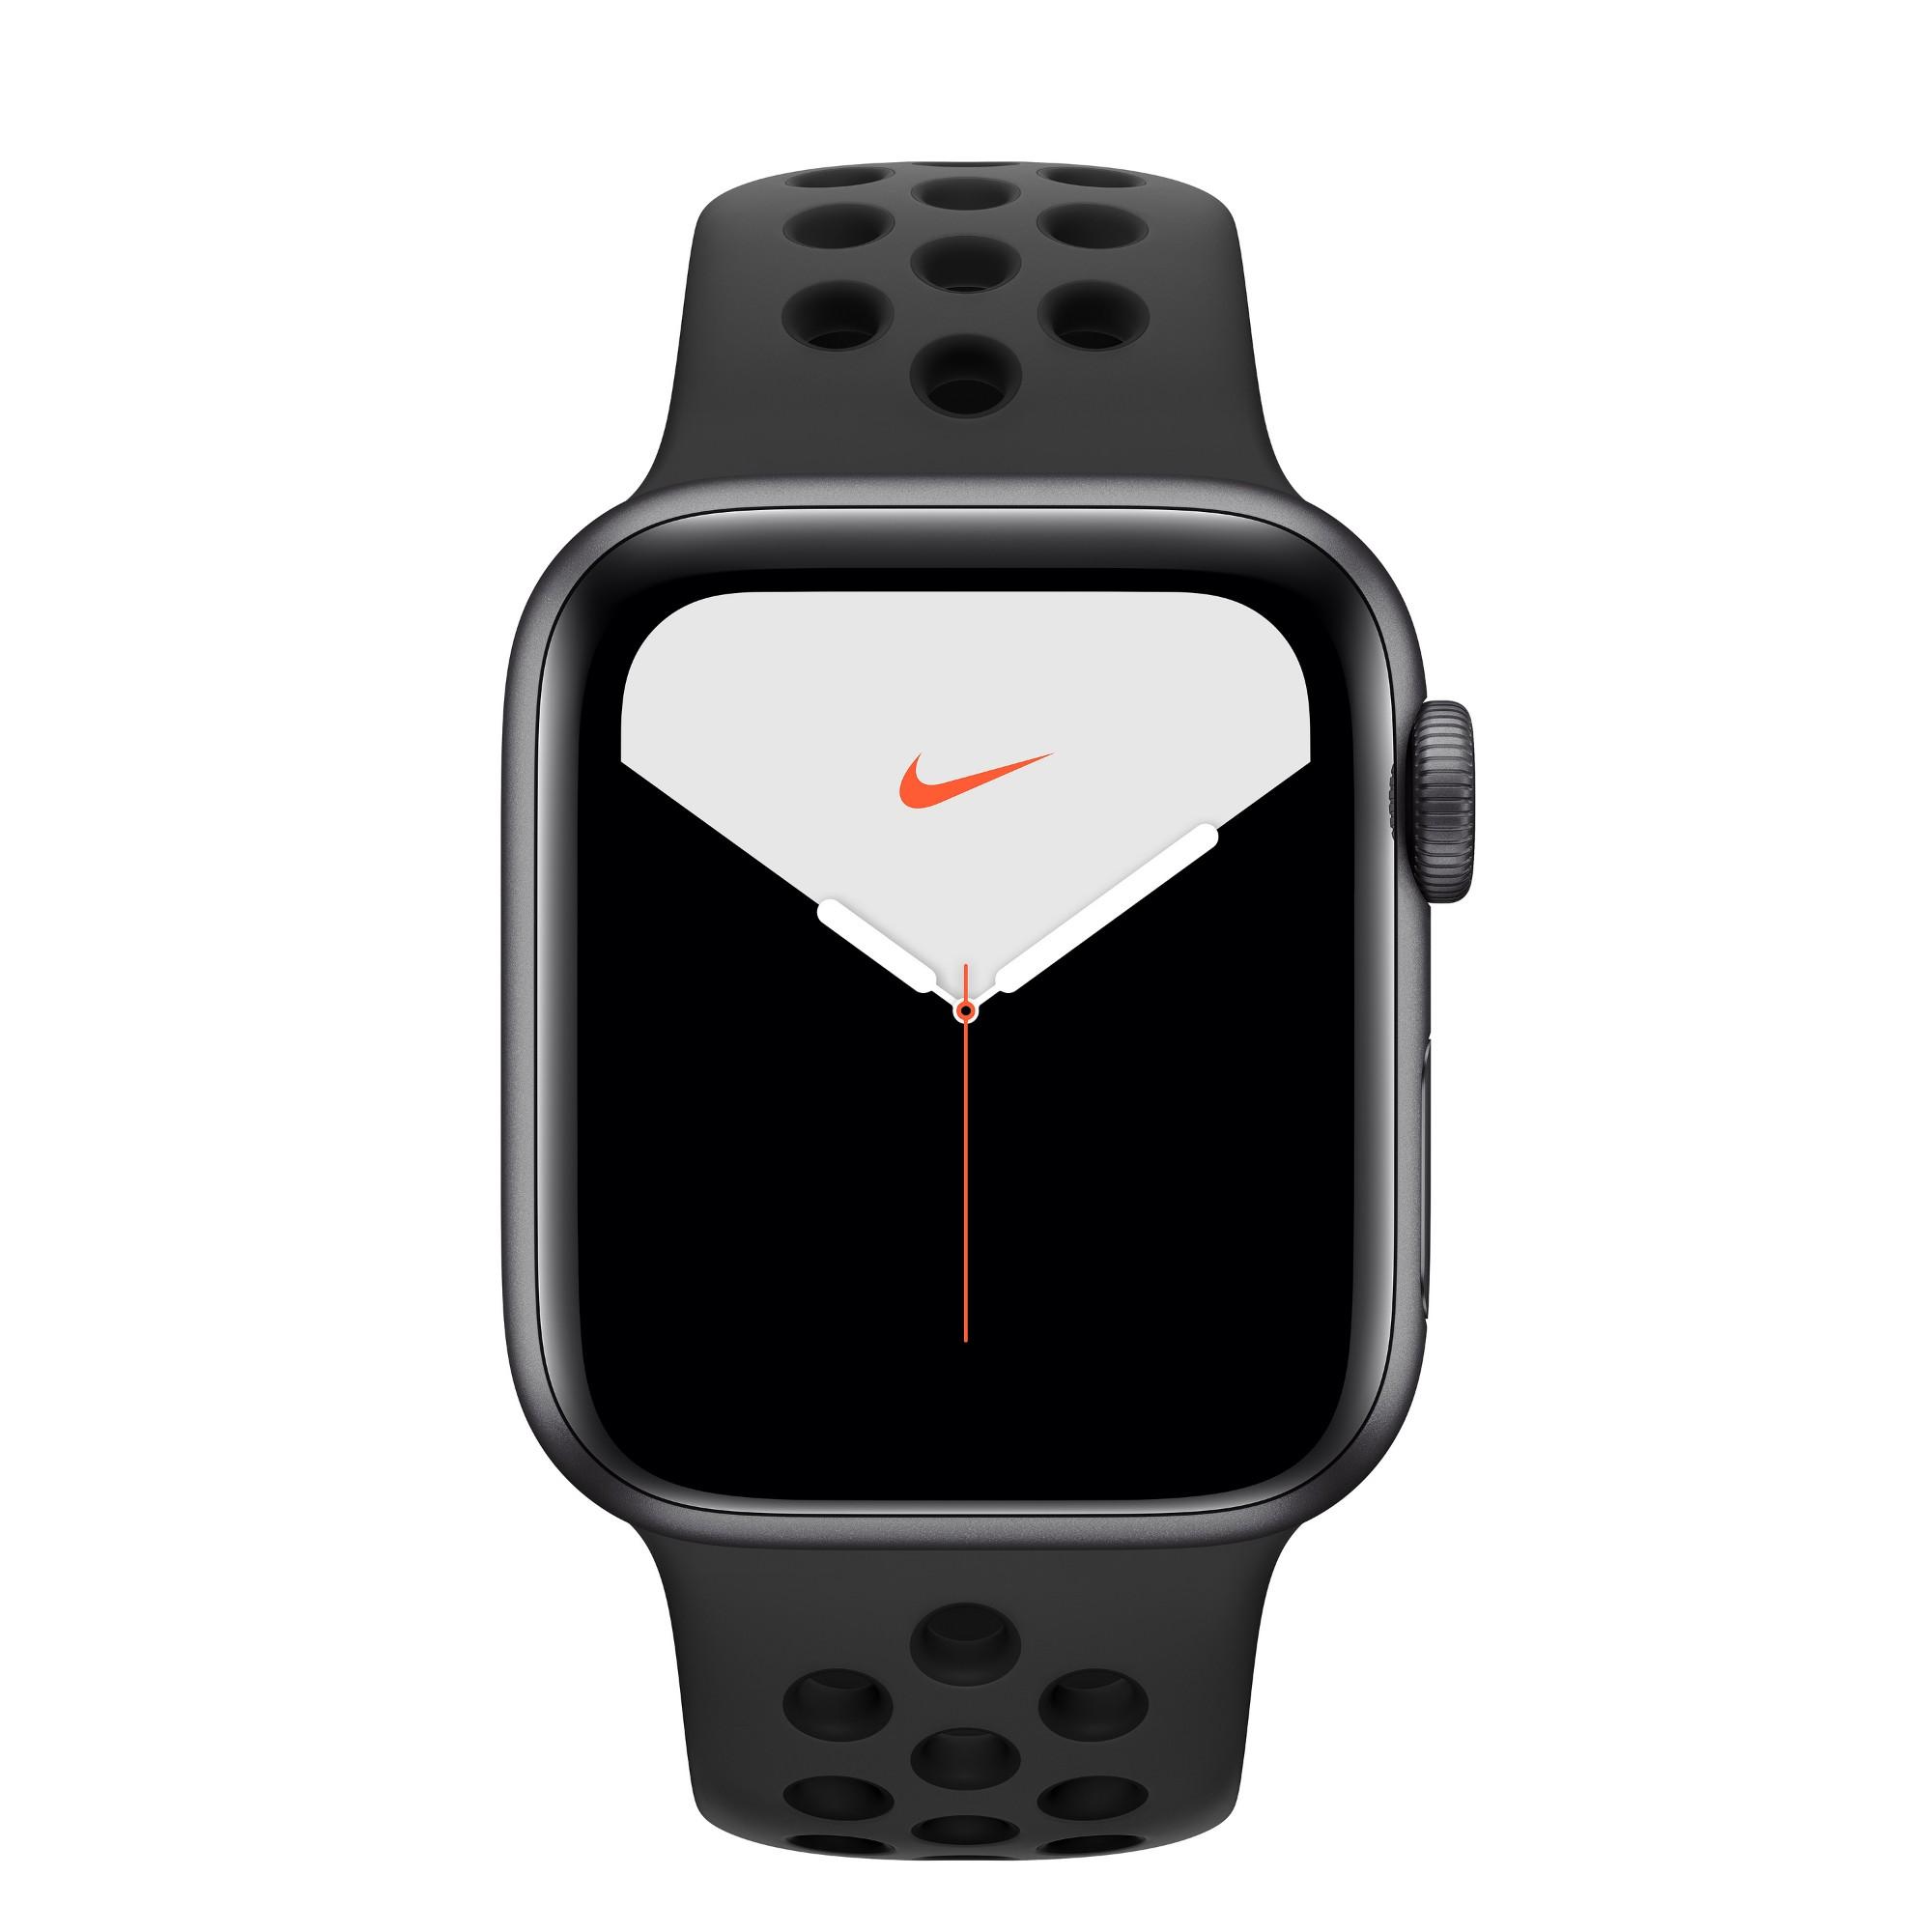 Apple Watch Nike Series 5 smartwatch Grey OLED GPS satellite